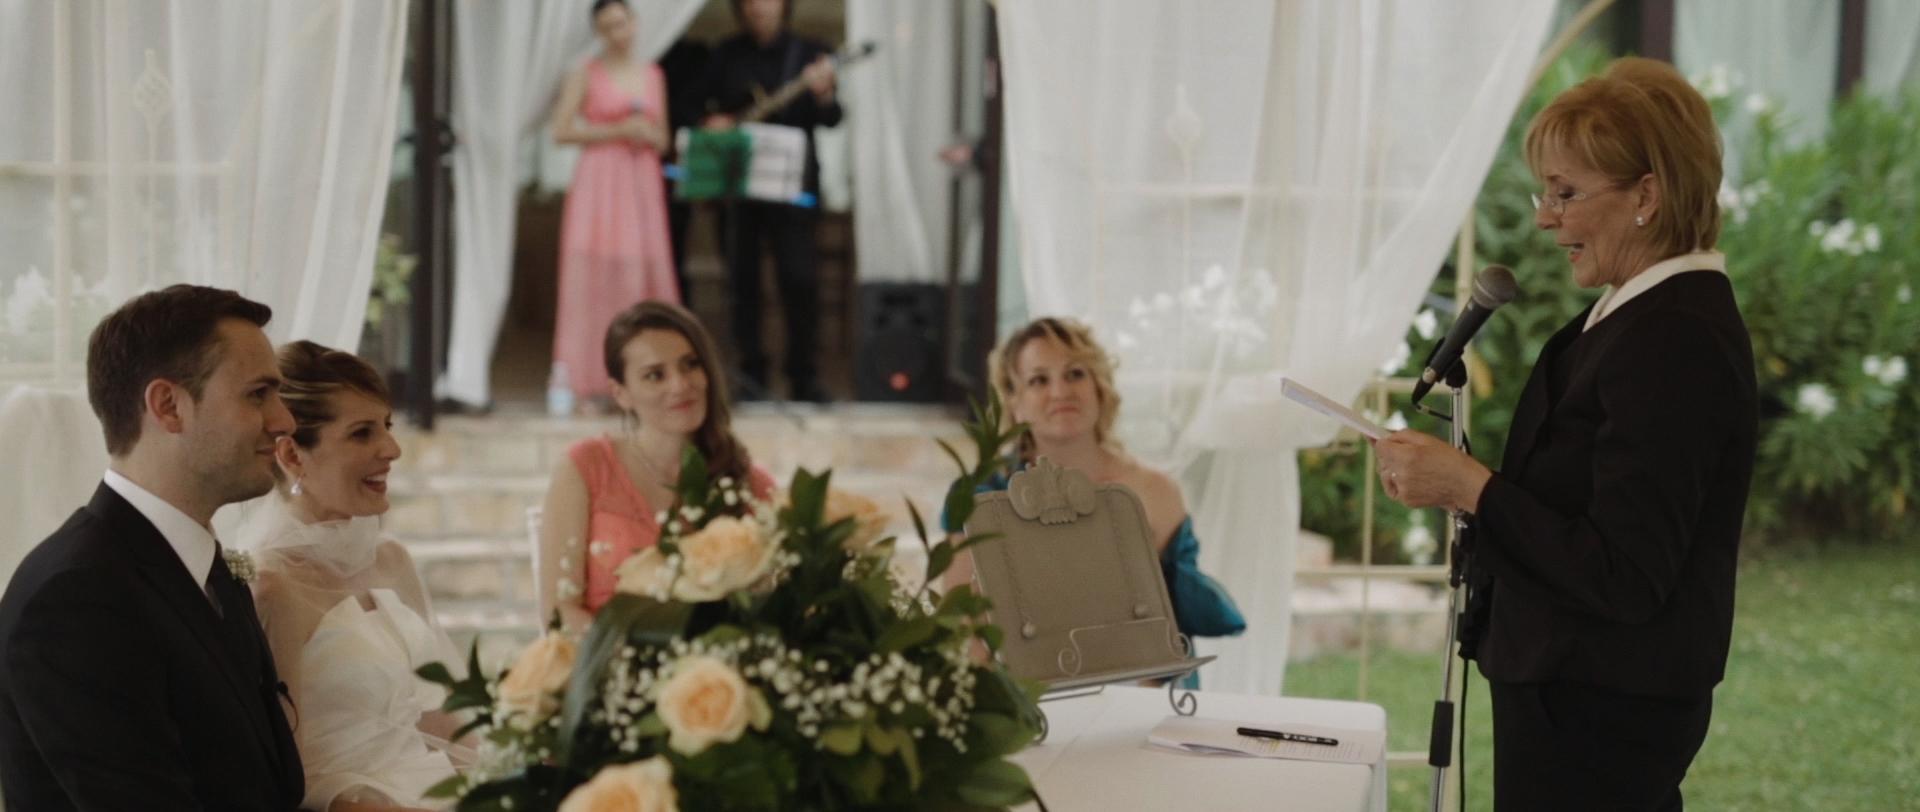 Frederic & Valentina | Trailer (Eng) 16